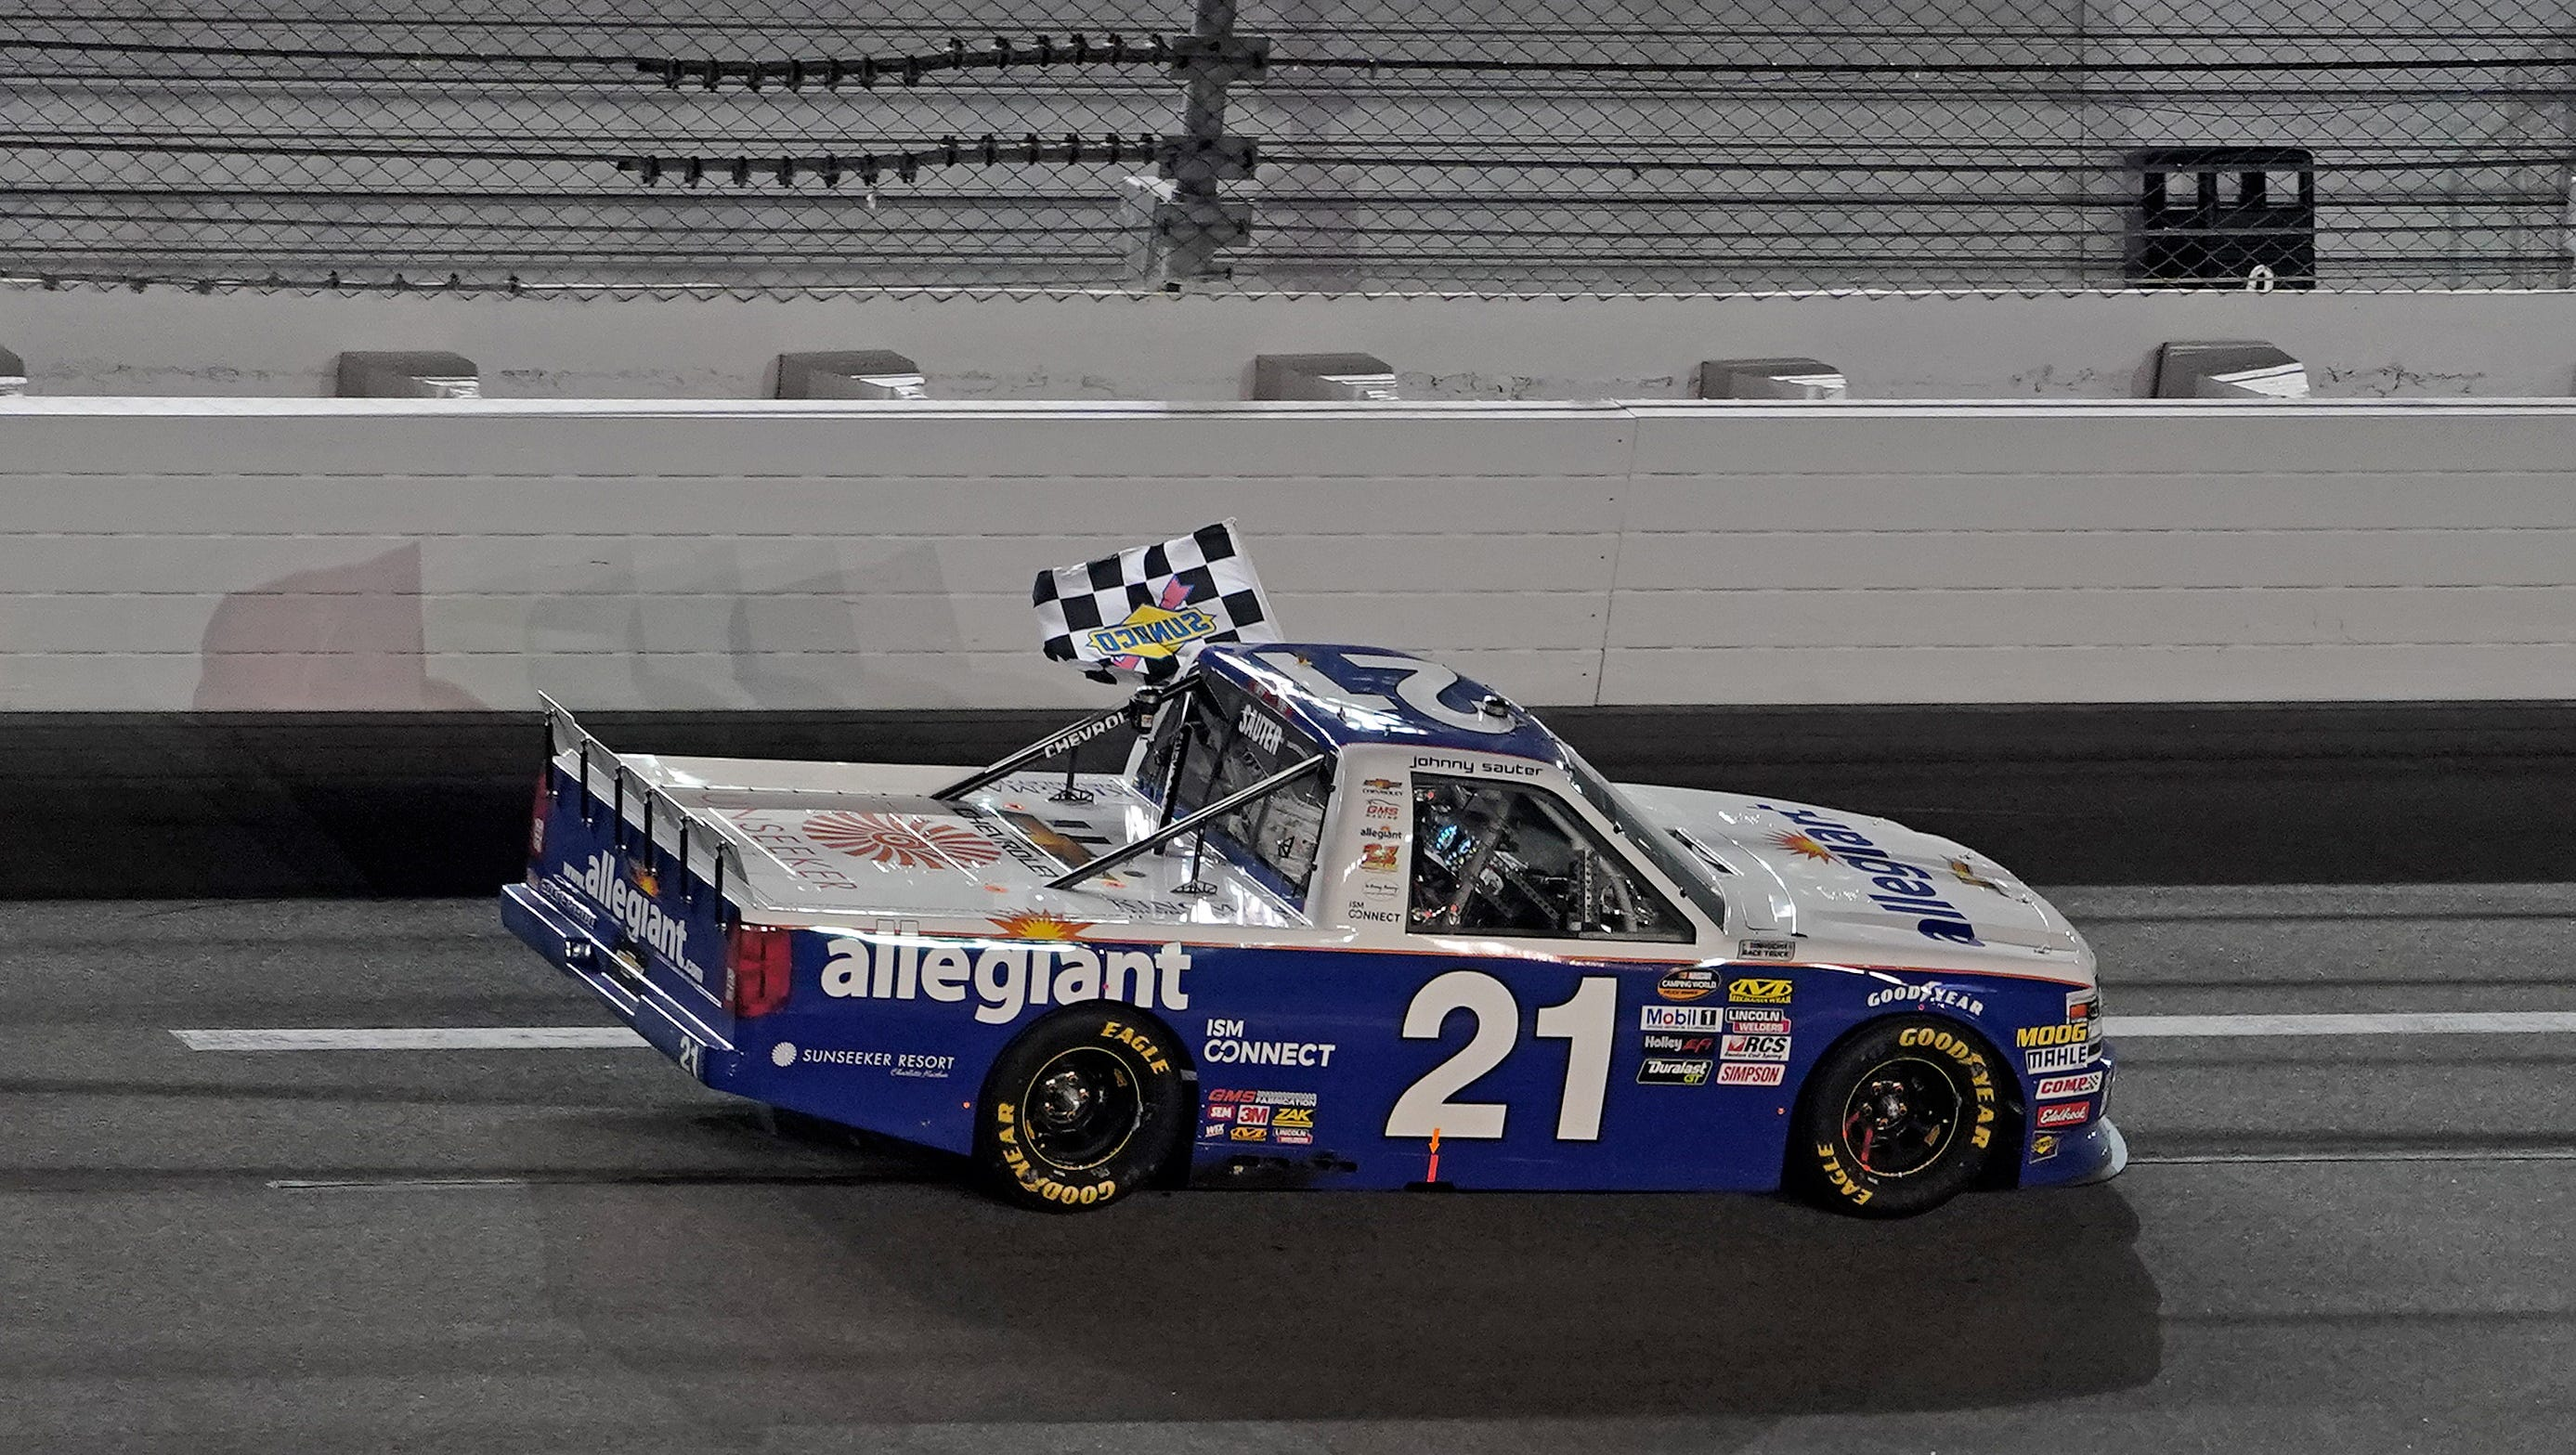 Ryan Newman Car Auto Window Flag Keep You Fit All The Time Racing-nascar Sports Mem, Cards & Fan Shop